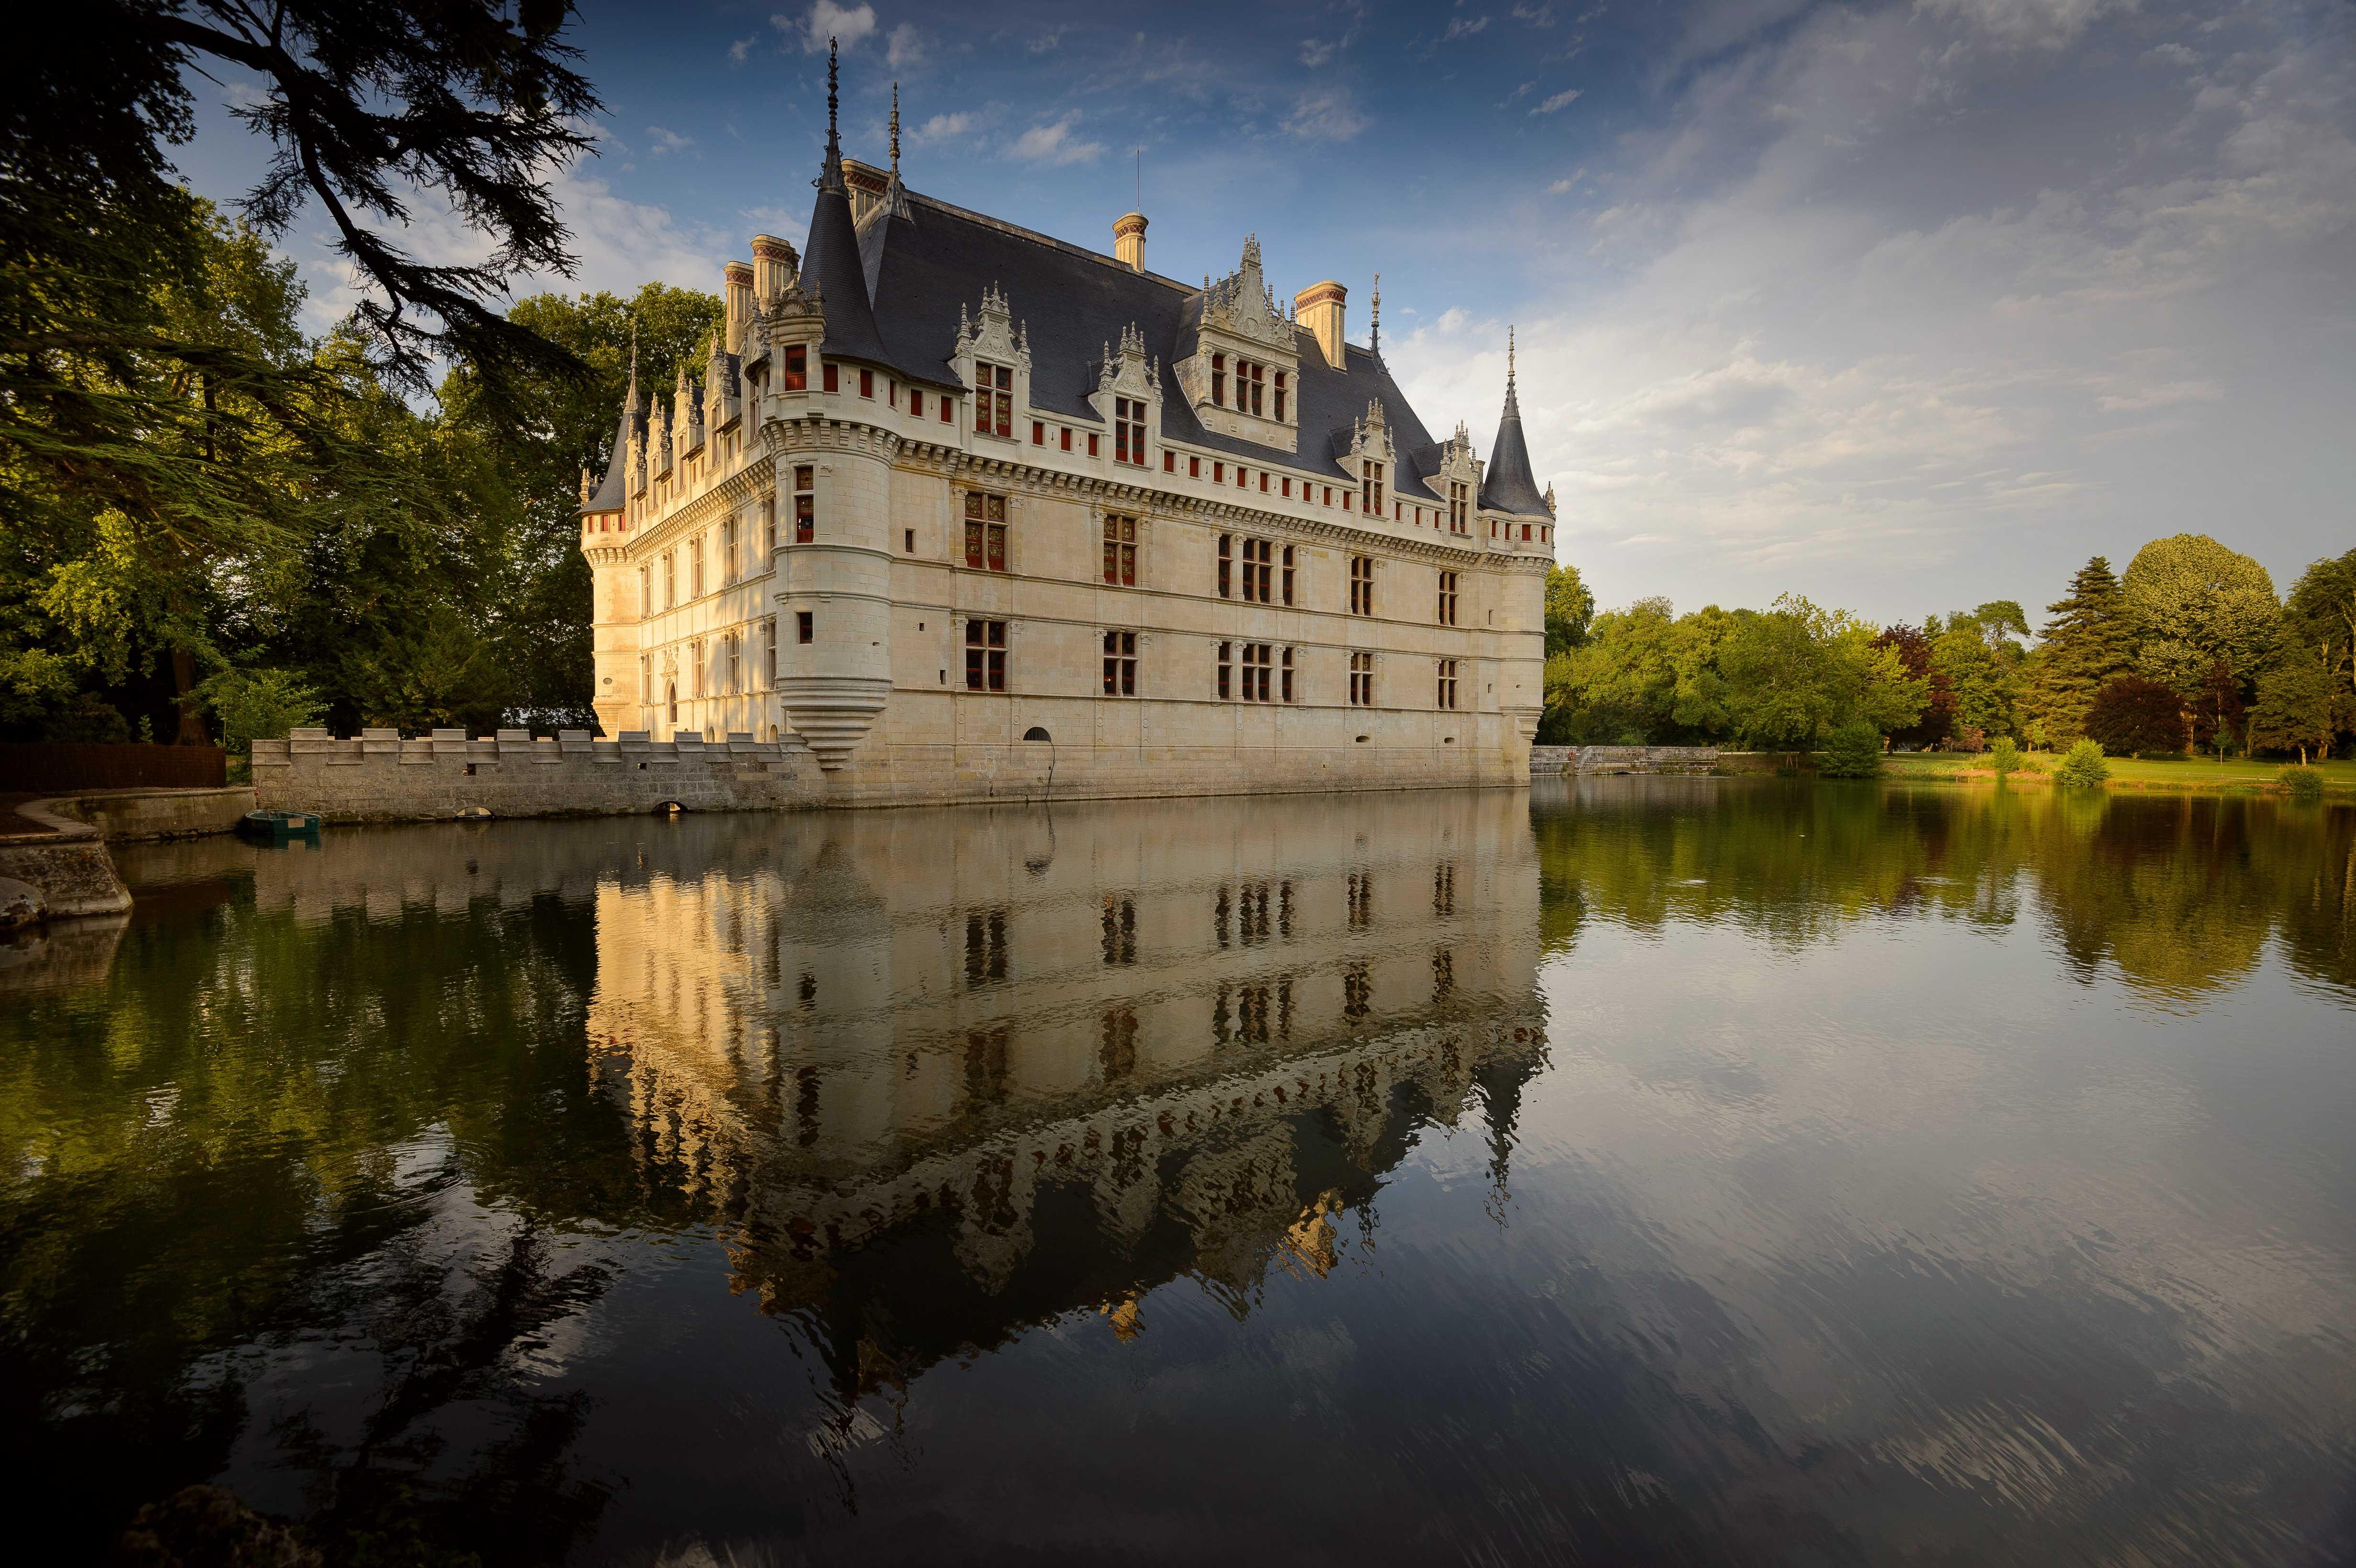 1. Façades du château d'Azay-le-Rideau - ©Léonard de Serres - CMN